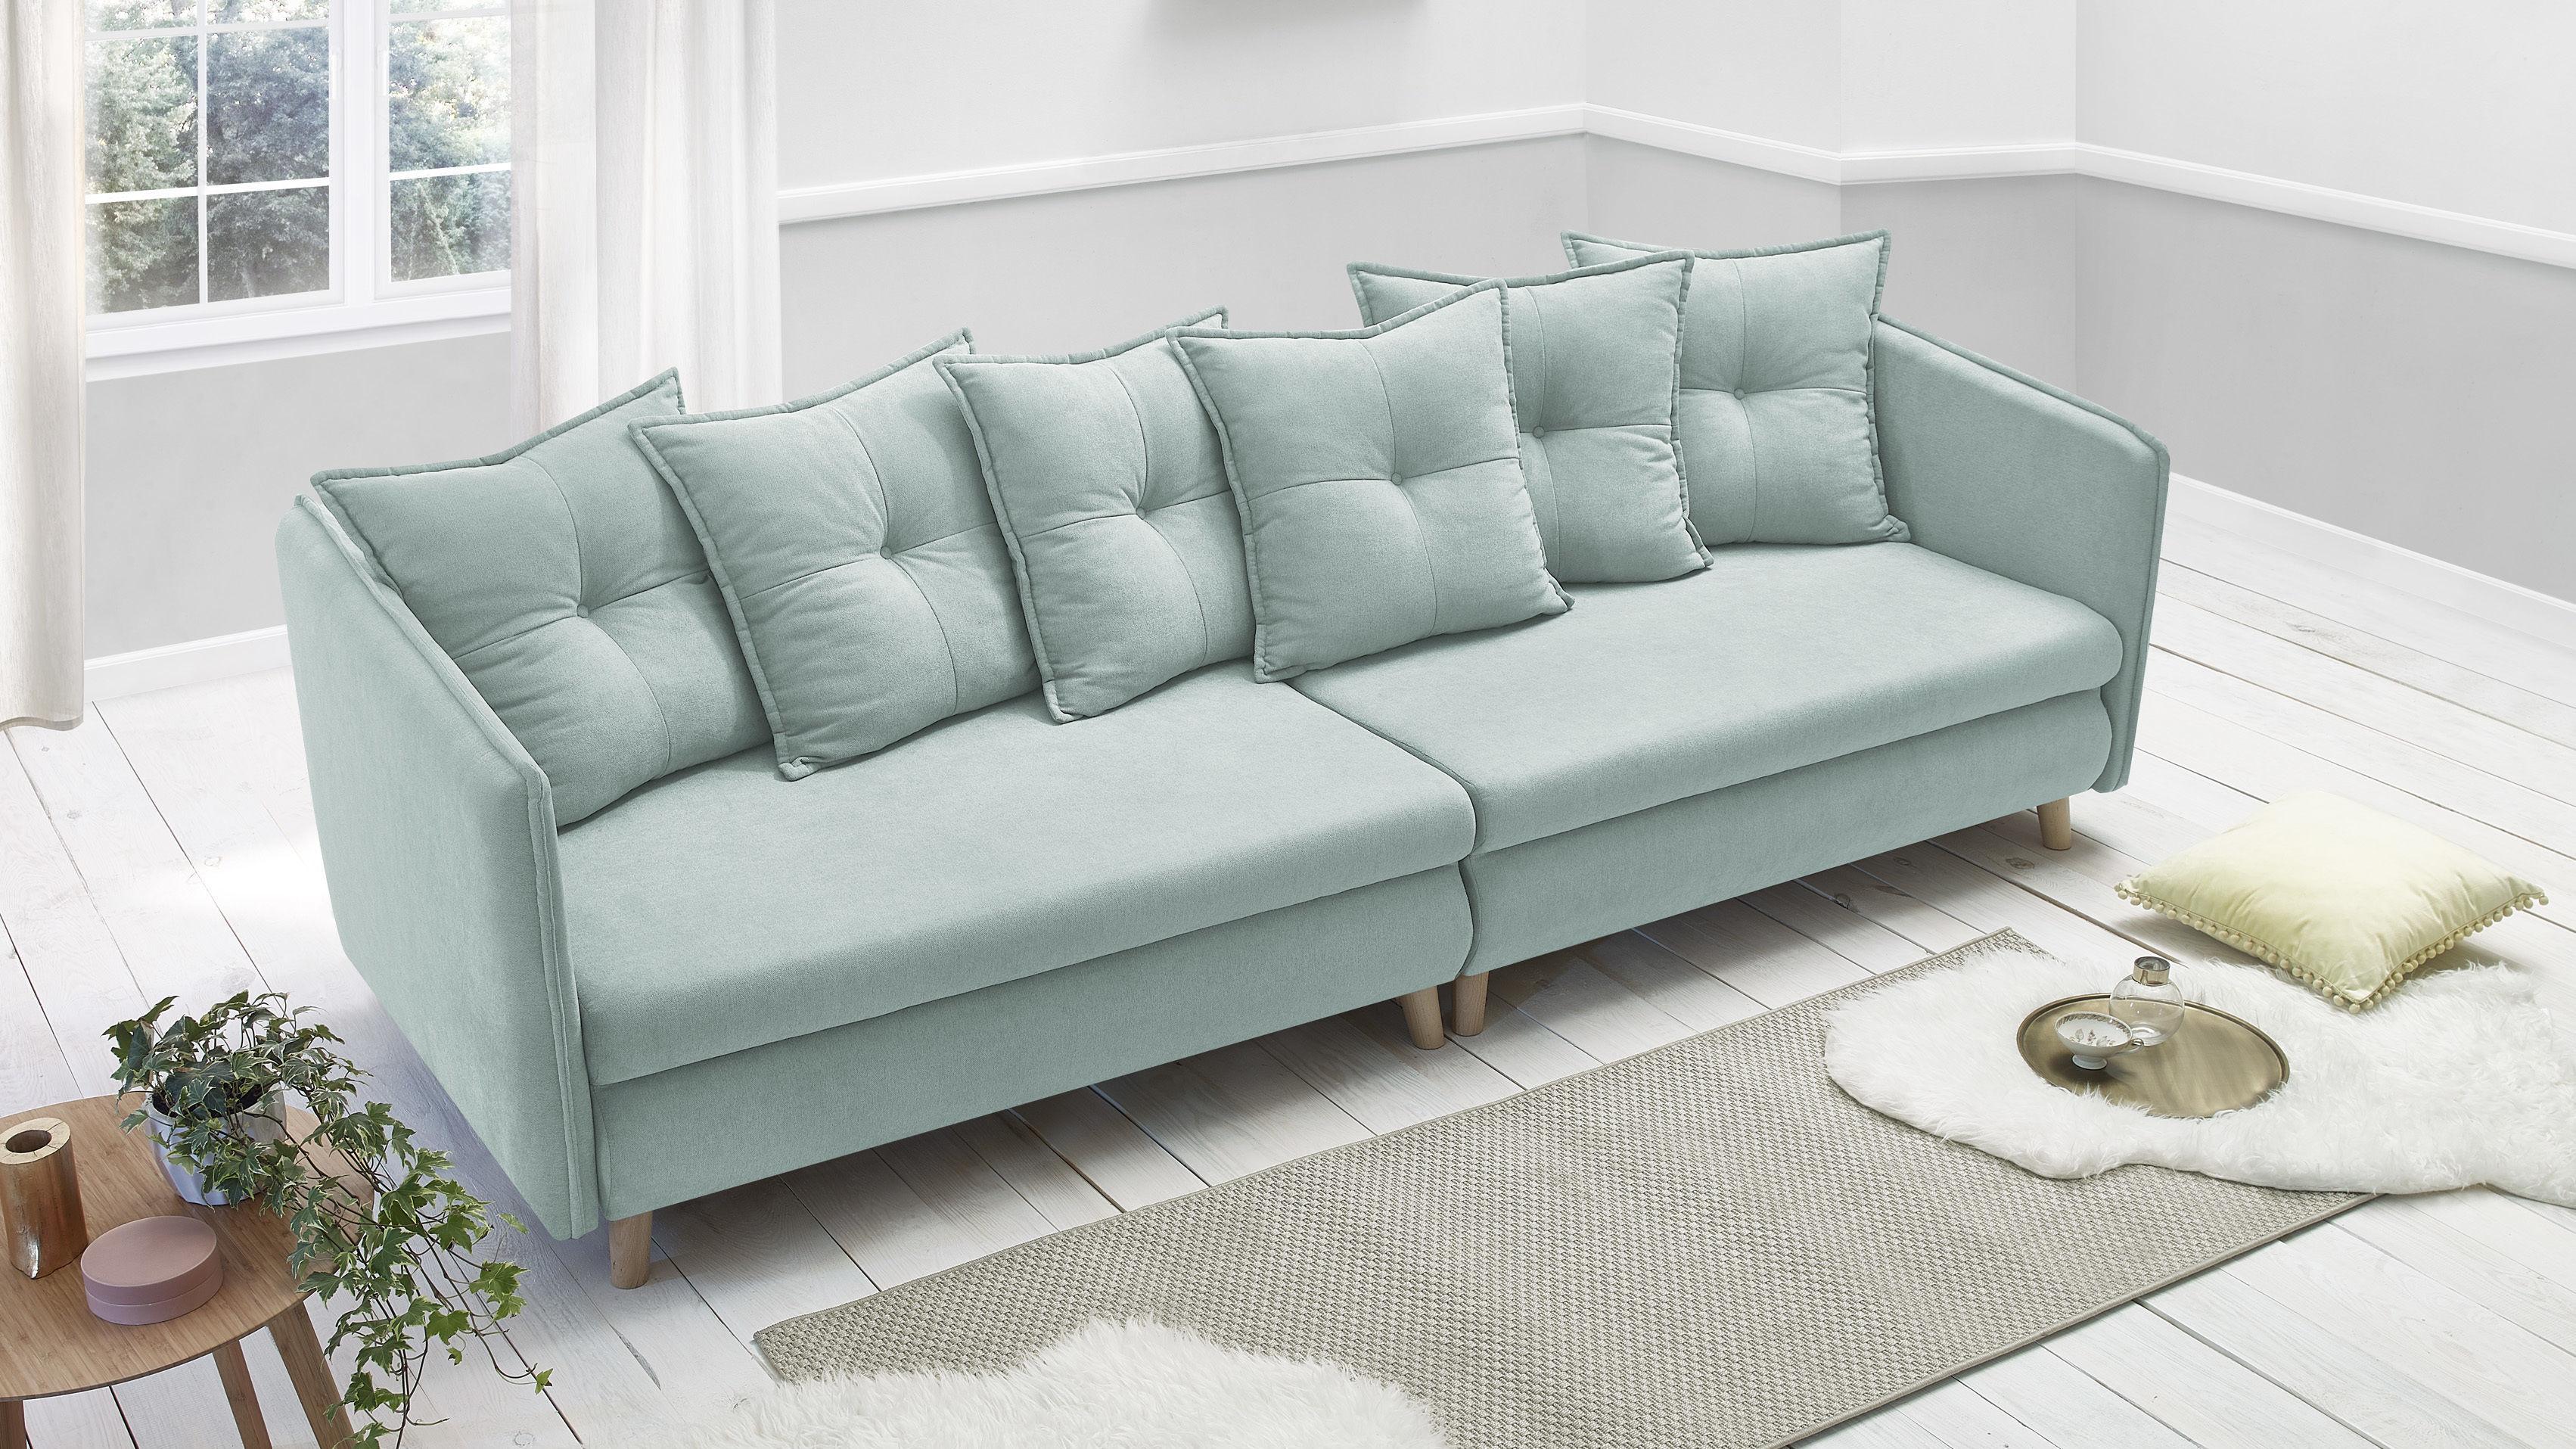 Bobochic canap opti sofa 4 places convertible for Canape 90 cm profondeur